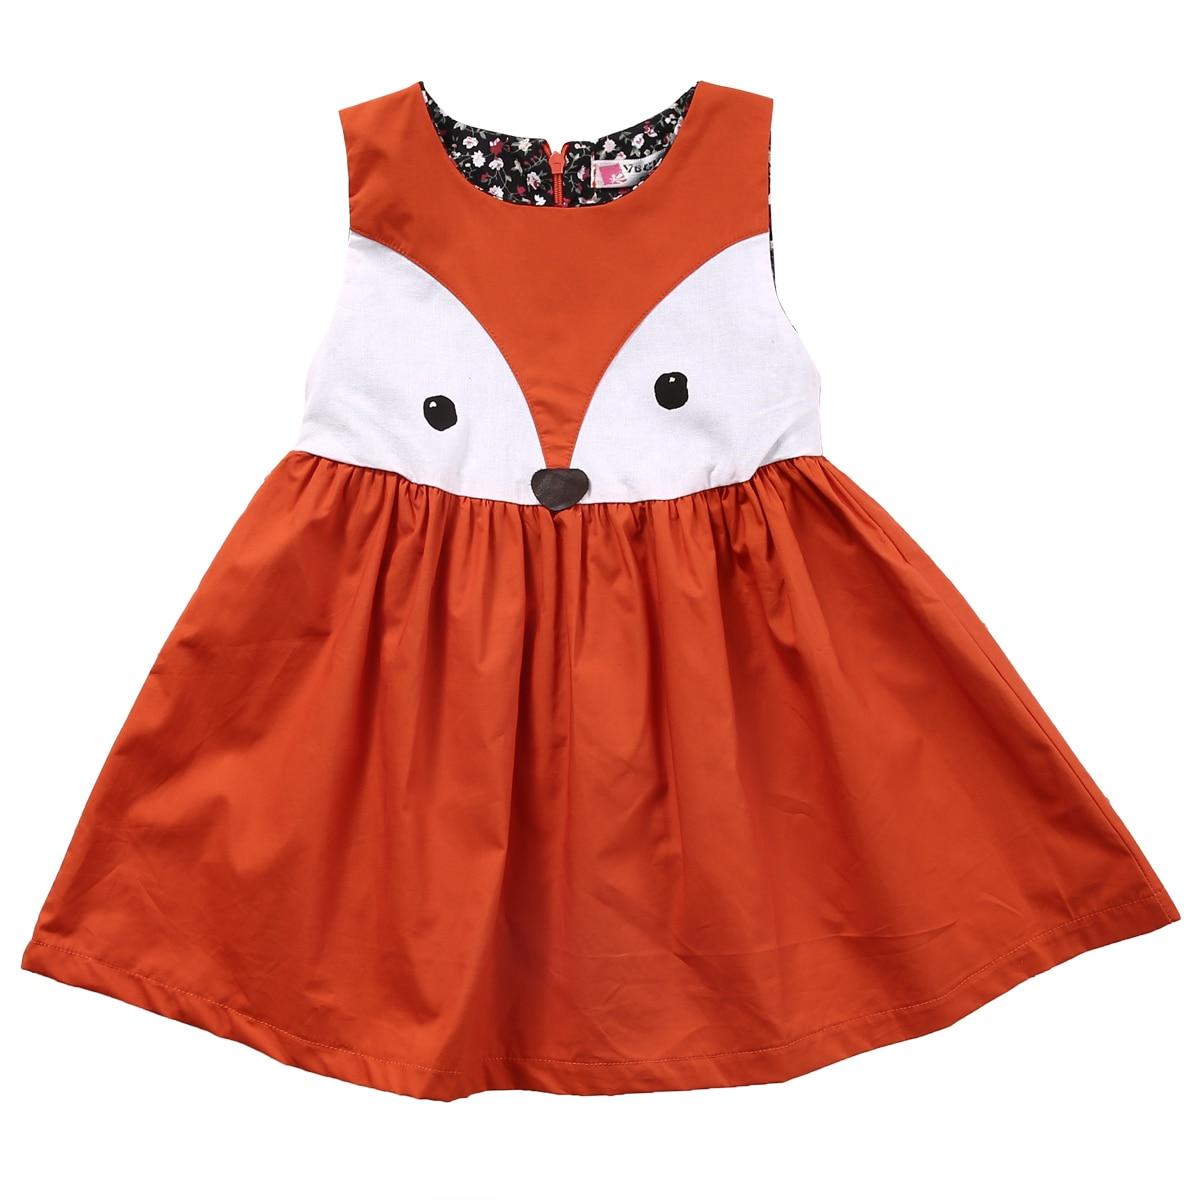 Hot 1-5Y Casual Baby Girls Toddler Kids Cute Fox Dress Sleeveless Formal Party Wedding Tutu Dresses